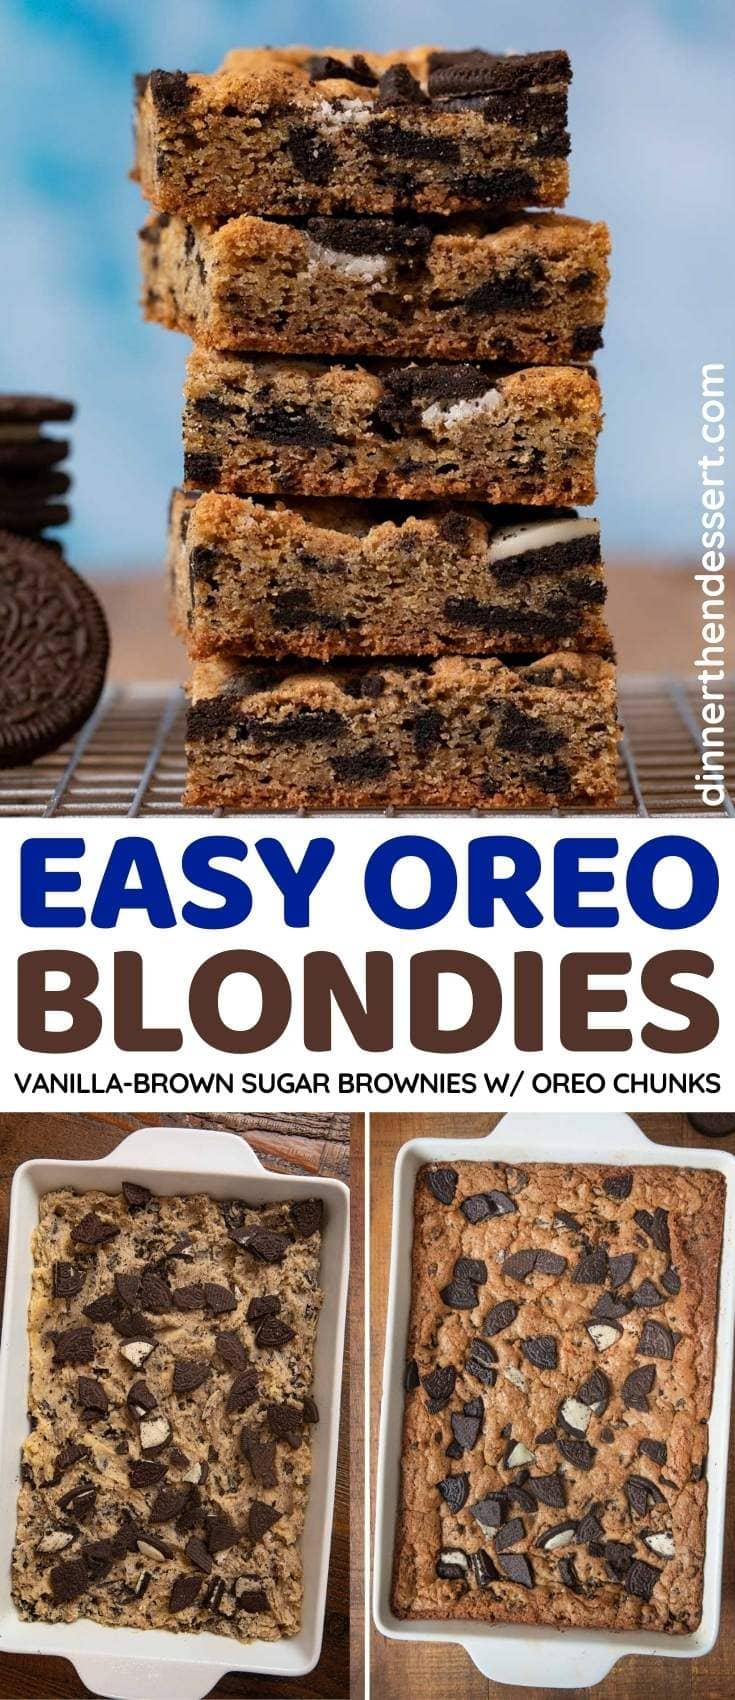 Oreo Blondies collage